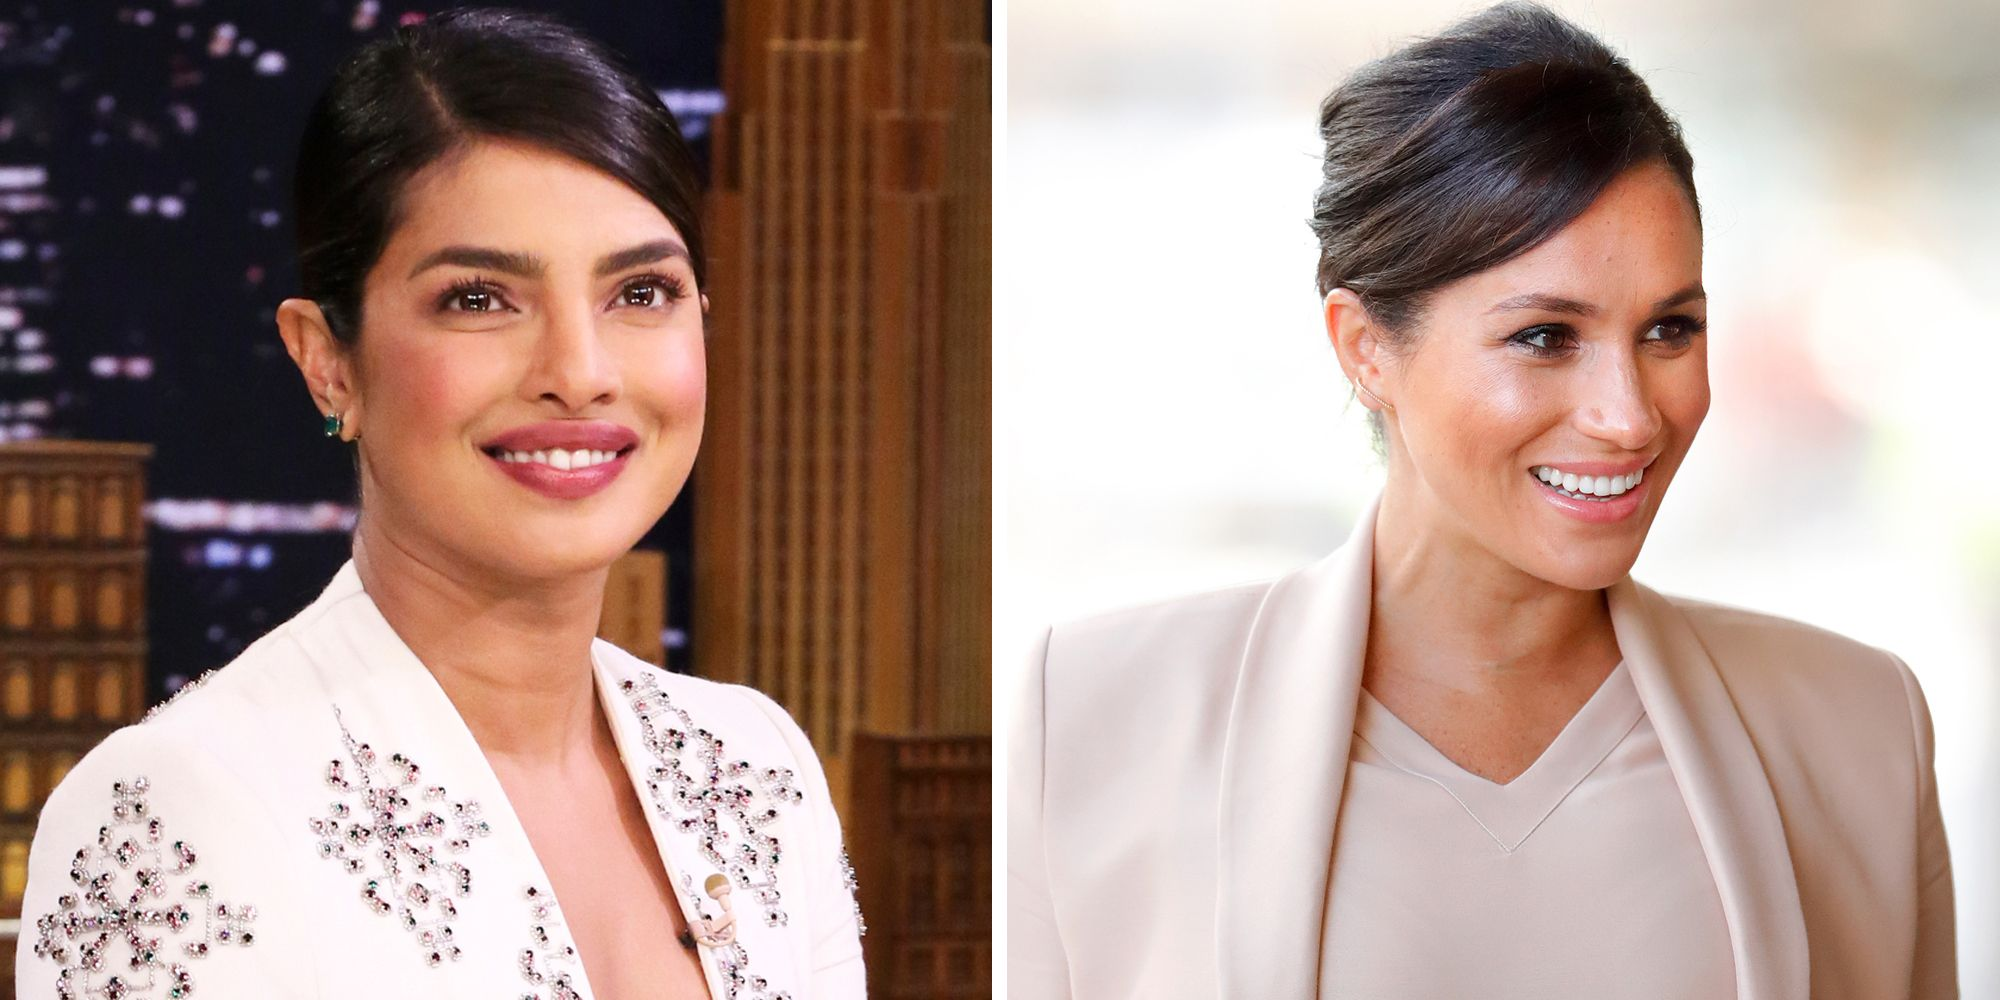 How Priyanka Chopra Responded to Meghan Markle Fighting Rumors